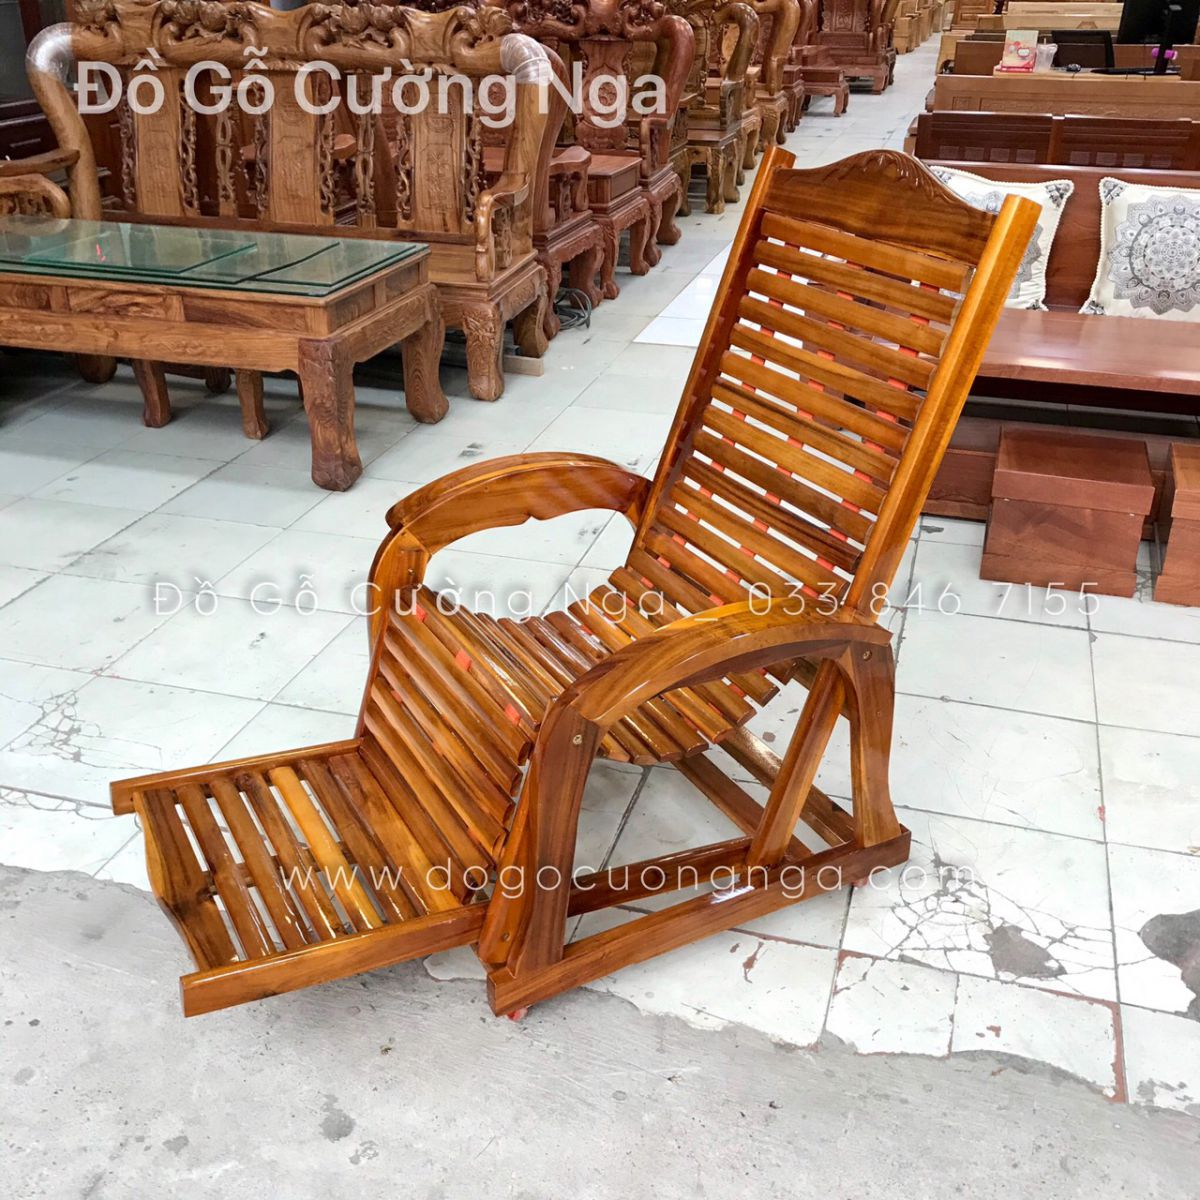 https://dogocuongnga.com/san-pham/ghe-day-go-tram-bong-vang-loai-3-day.html